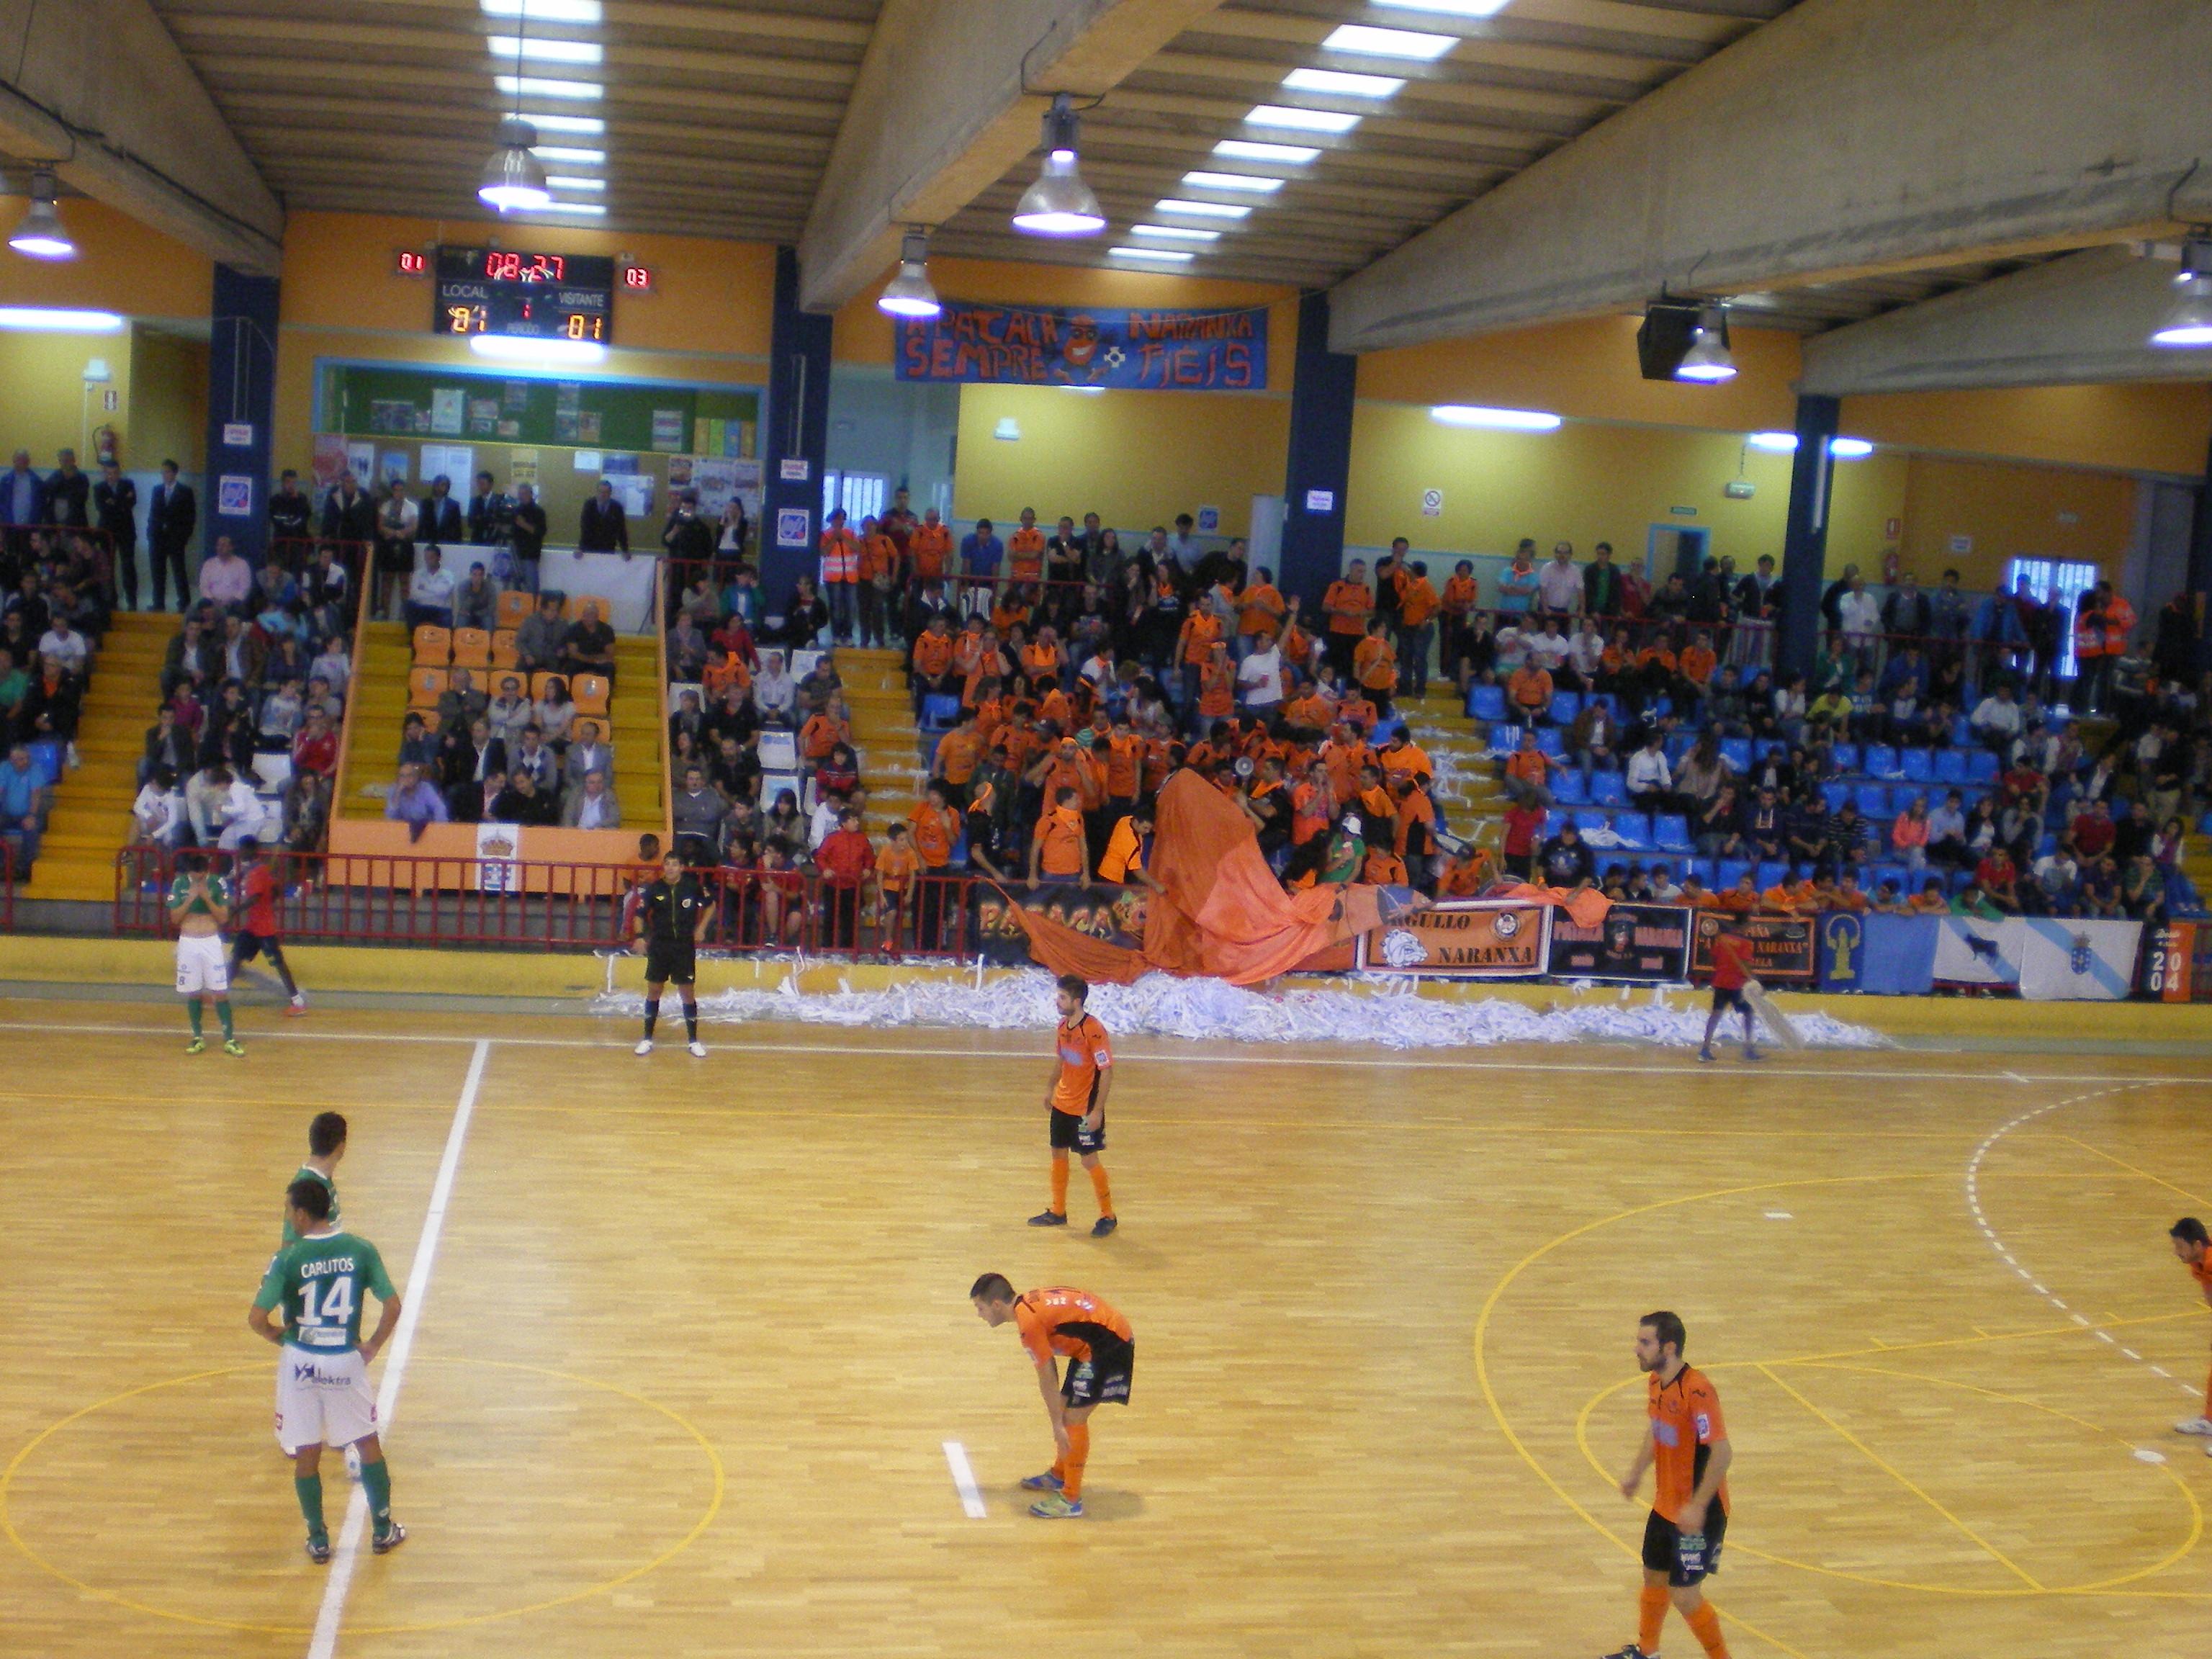 Burela FS - Triman Navarra: victoria navarra en el último minuto